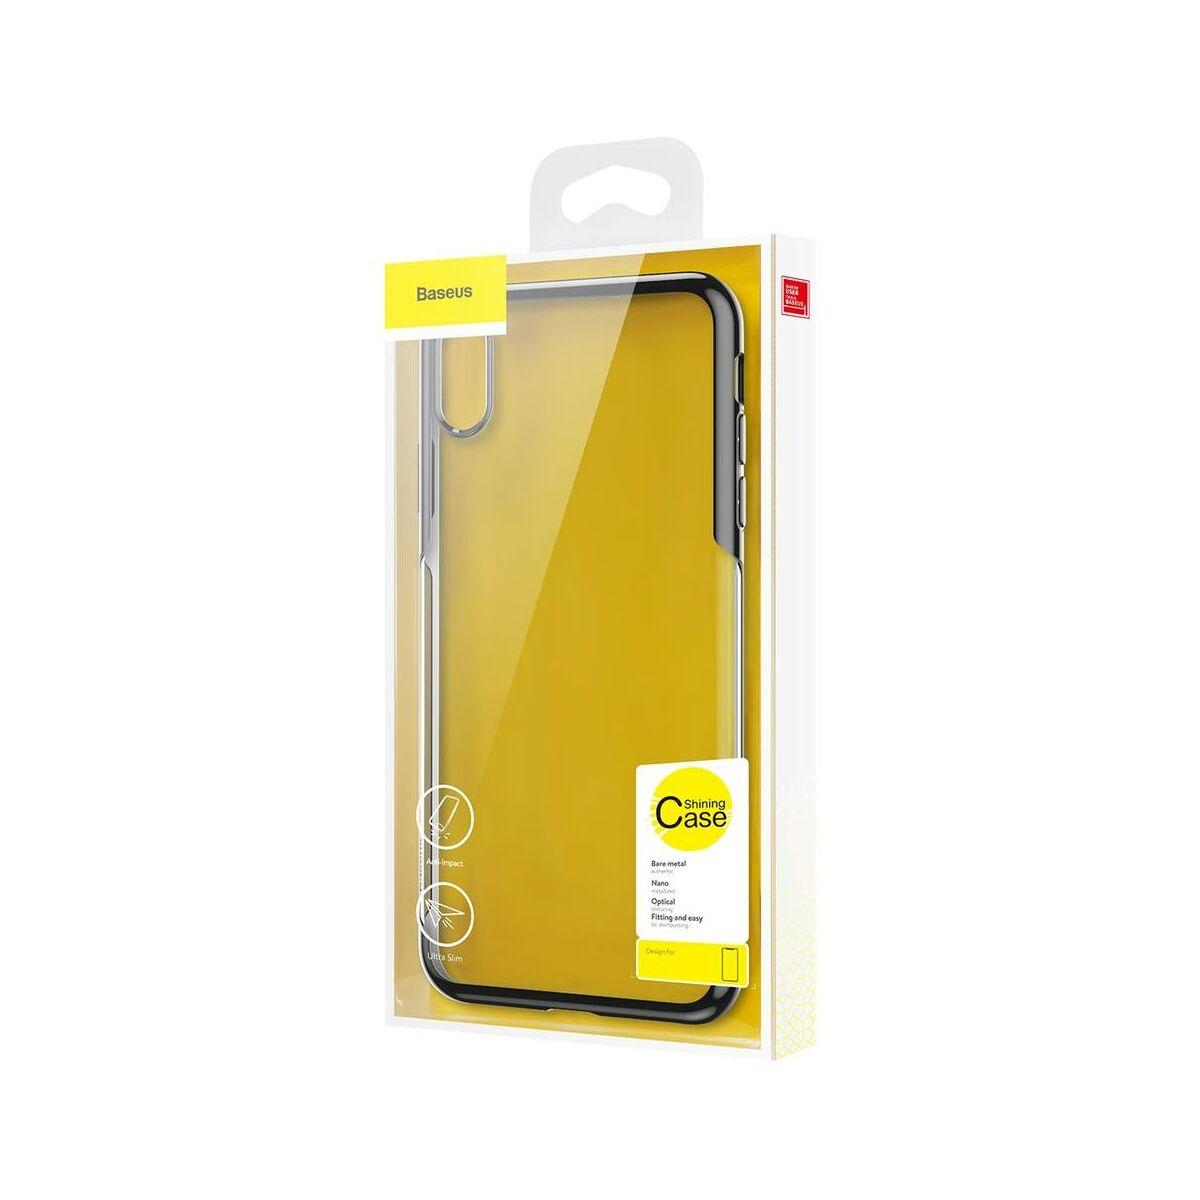 Baseus iPhone X/XS tok, Shining, asztro szürke (ARAPIPHX-MD0G)